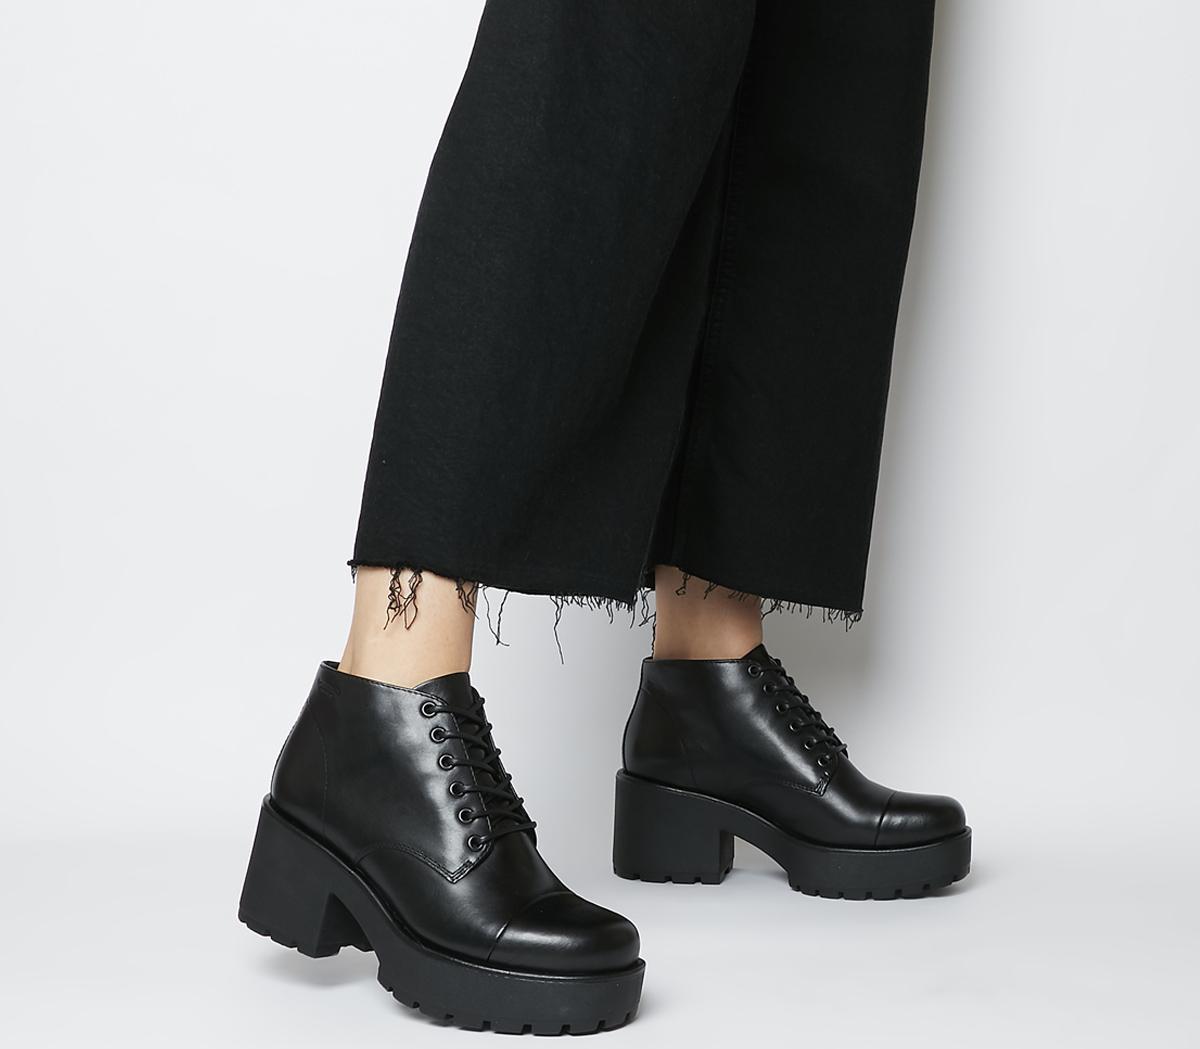 Vagabond Dioon Lace Up Boots Black